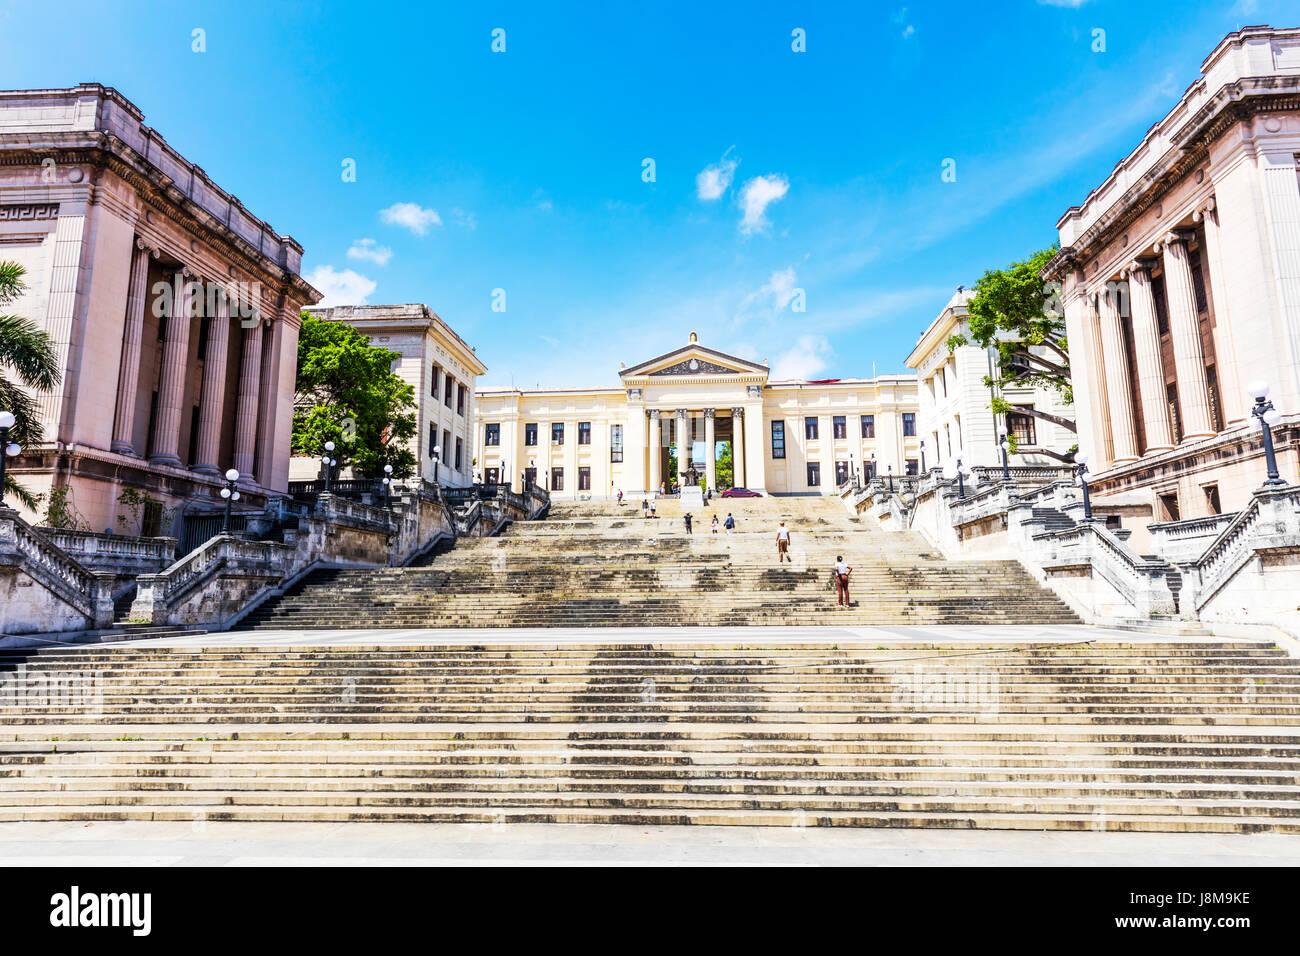 The Alma Mater statue in front of the University of Havana, Universidad de La Habana, entrance, Havana, Cuba - Stock Image